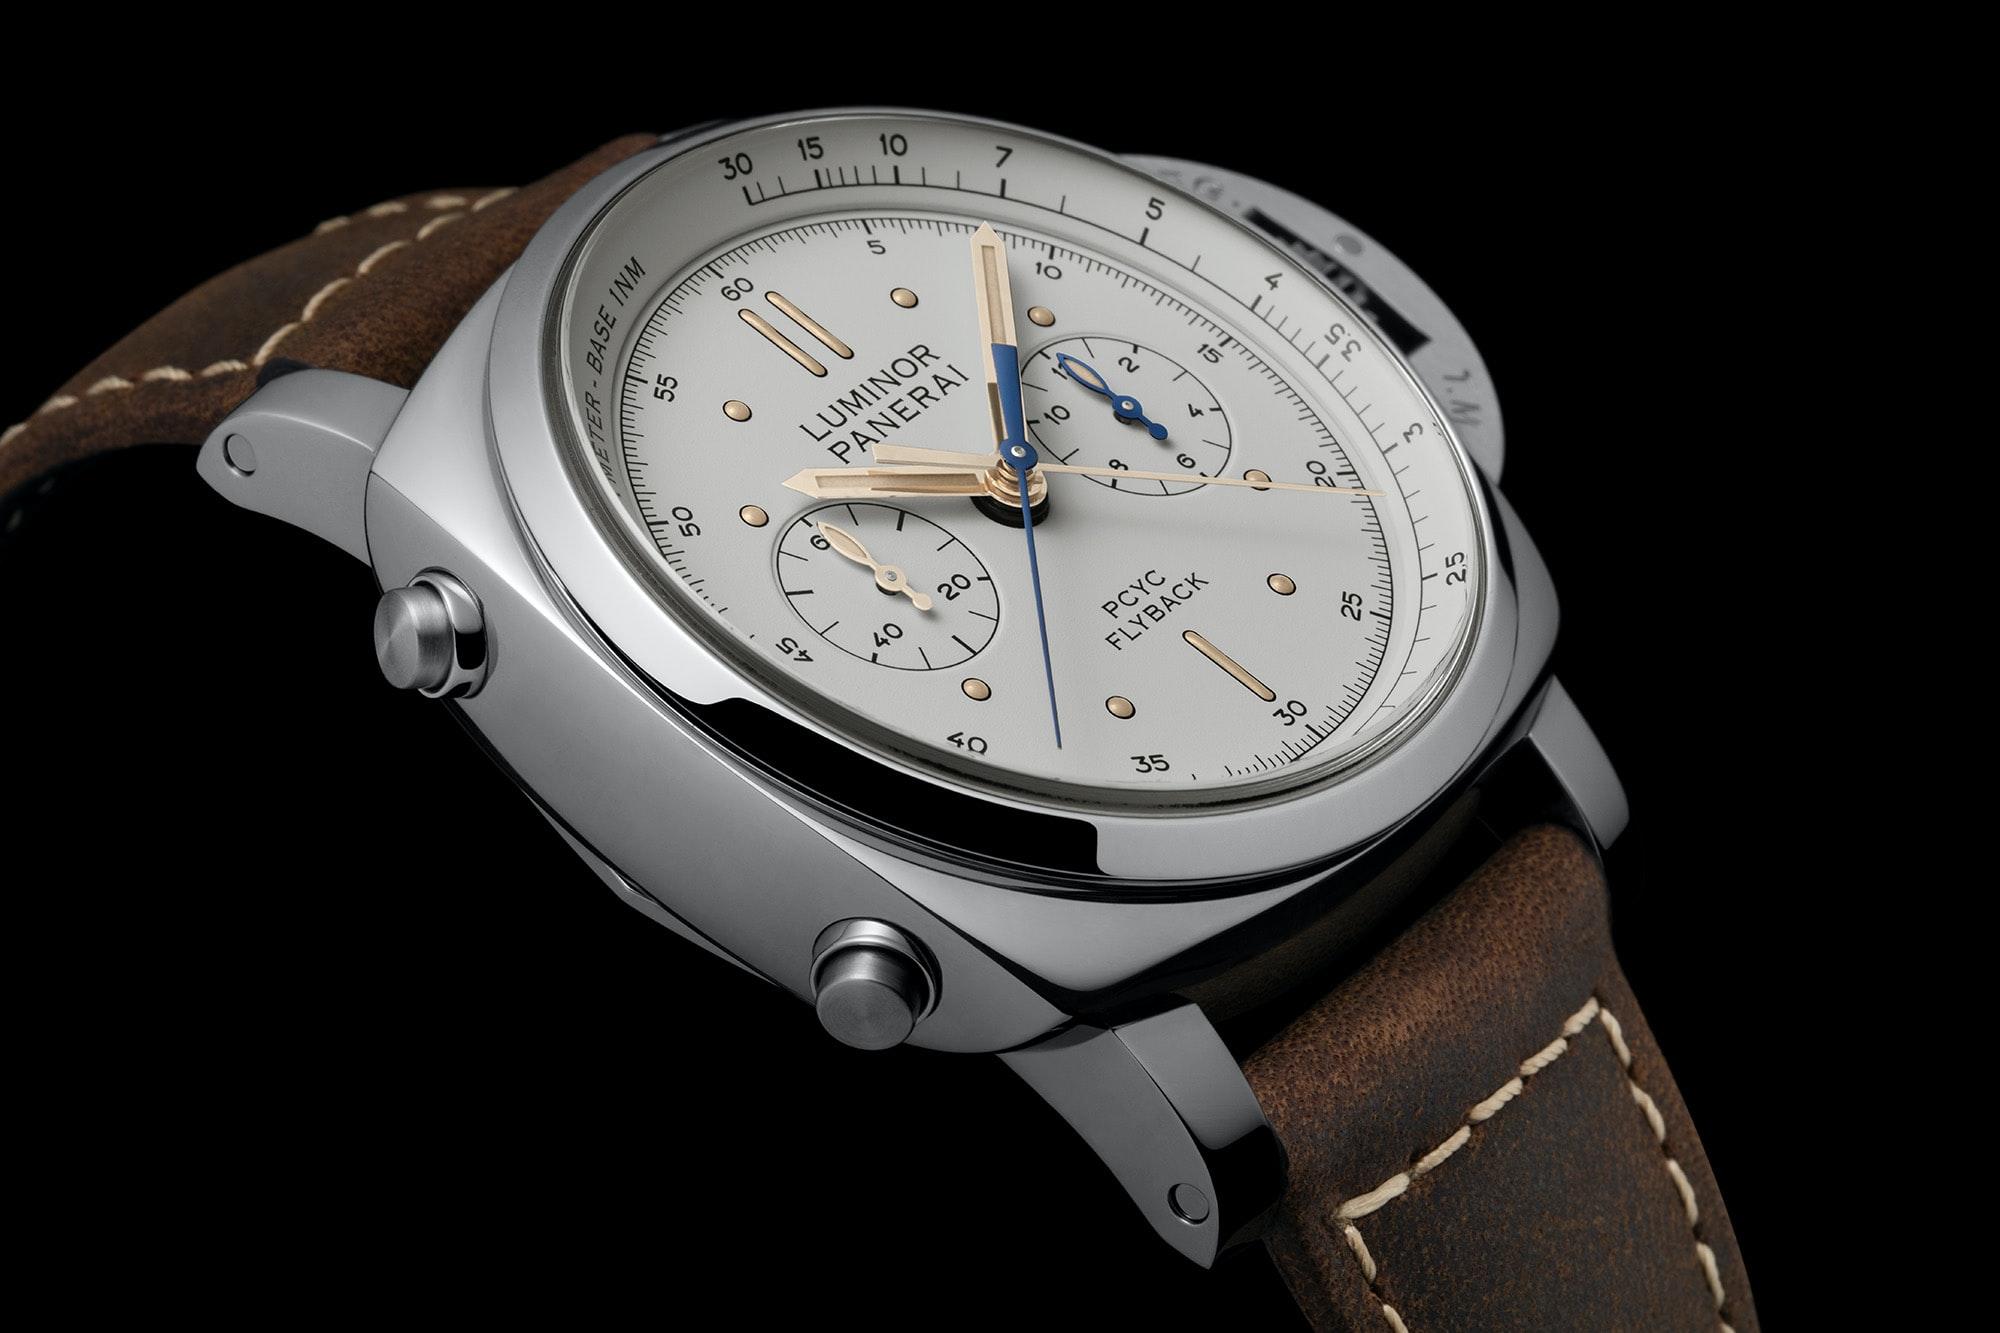 Luminor Marina Flyback Chrono replica watch